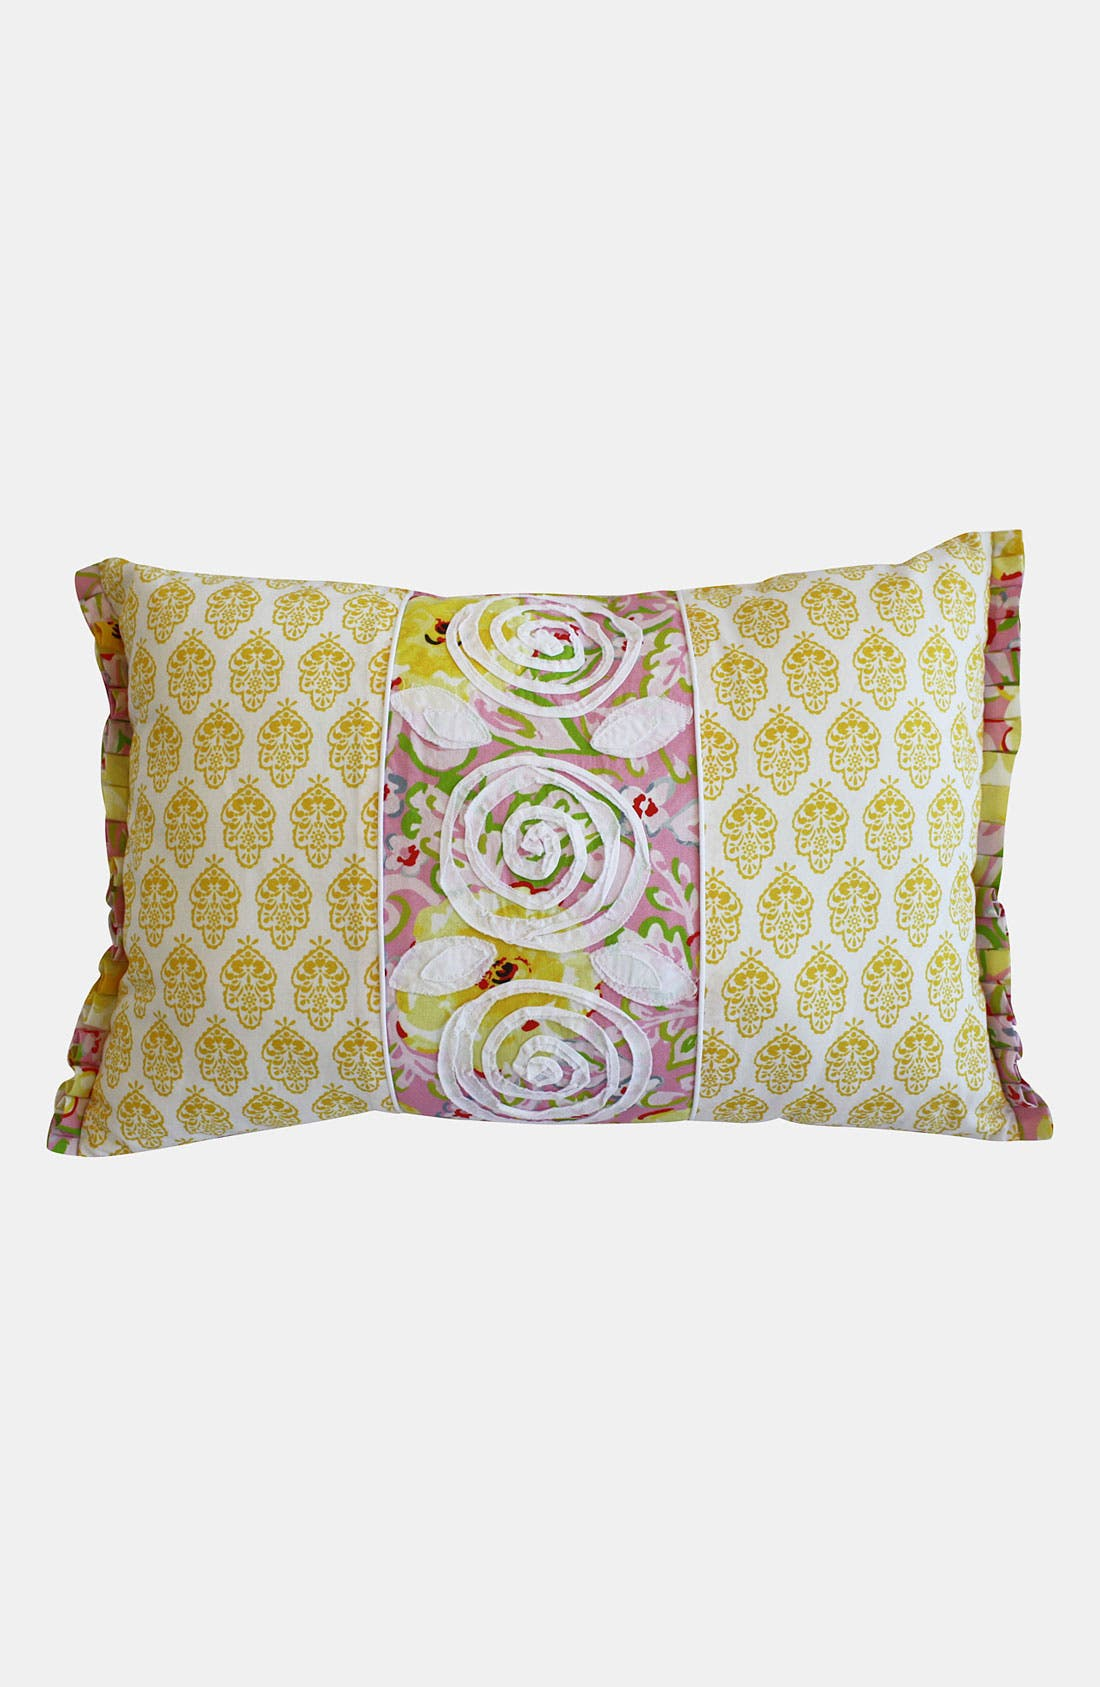 Alternate Image 1 Selected - Dena Home 'Annabelle' Appliqué Pillow